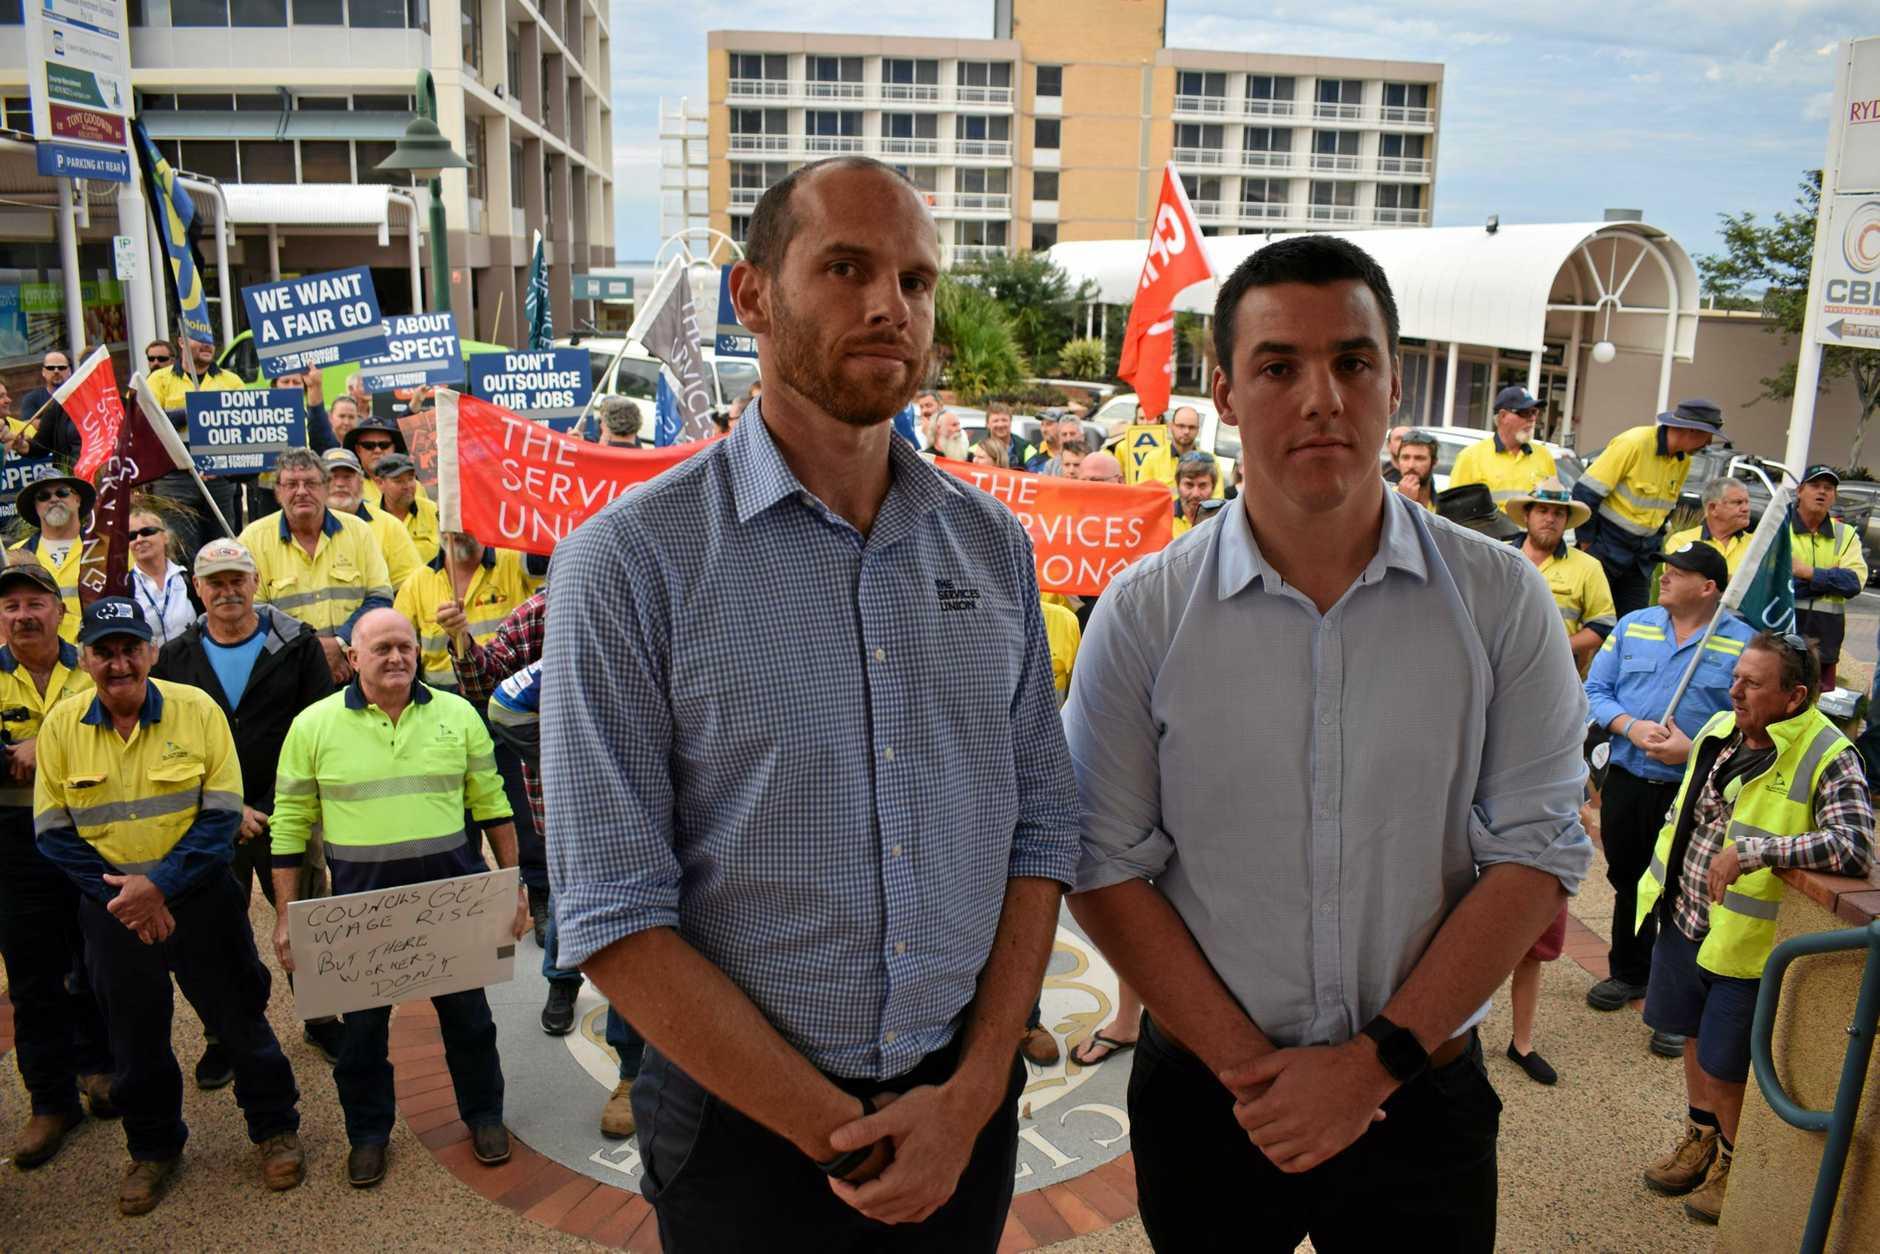 Australian Services Union Central Queensland organiser Chris McJannett and Australian Workers' Union Gladstone organiser Zac Beers.